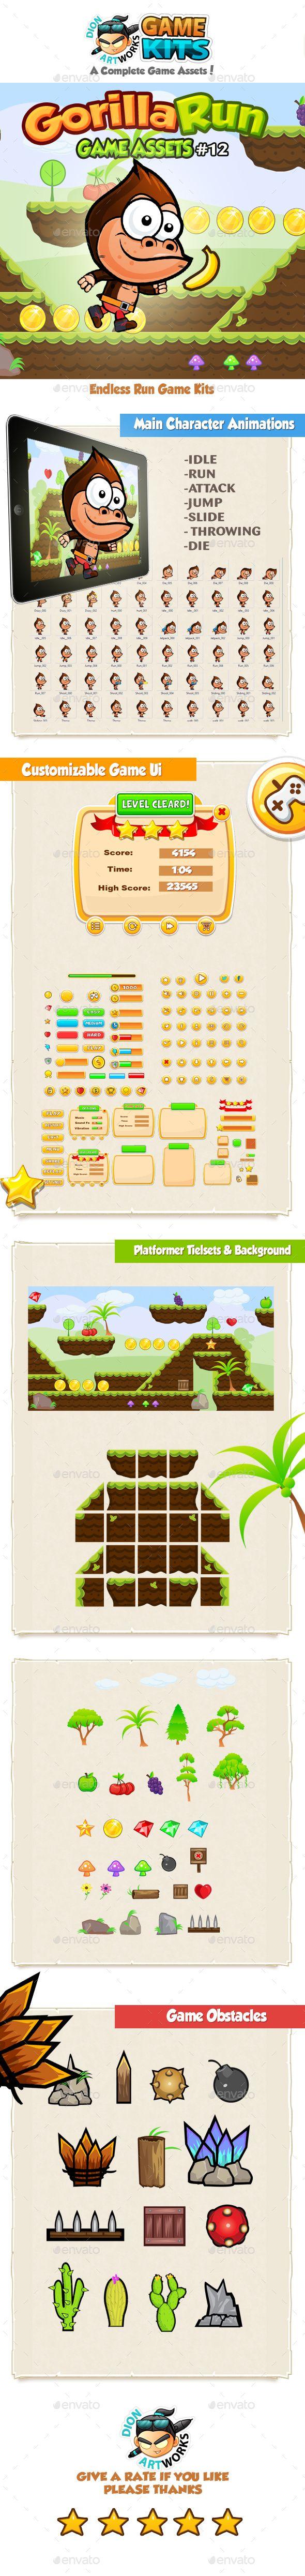 Gorilla Run Platformer Game Assets 12 - Game #Kits #Game #Assets | Download http://graphicriver.net/item/gorilla-run-platformer-game-assets-12/14404283?ref=sinzo